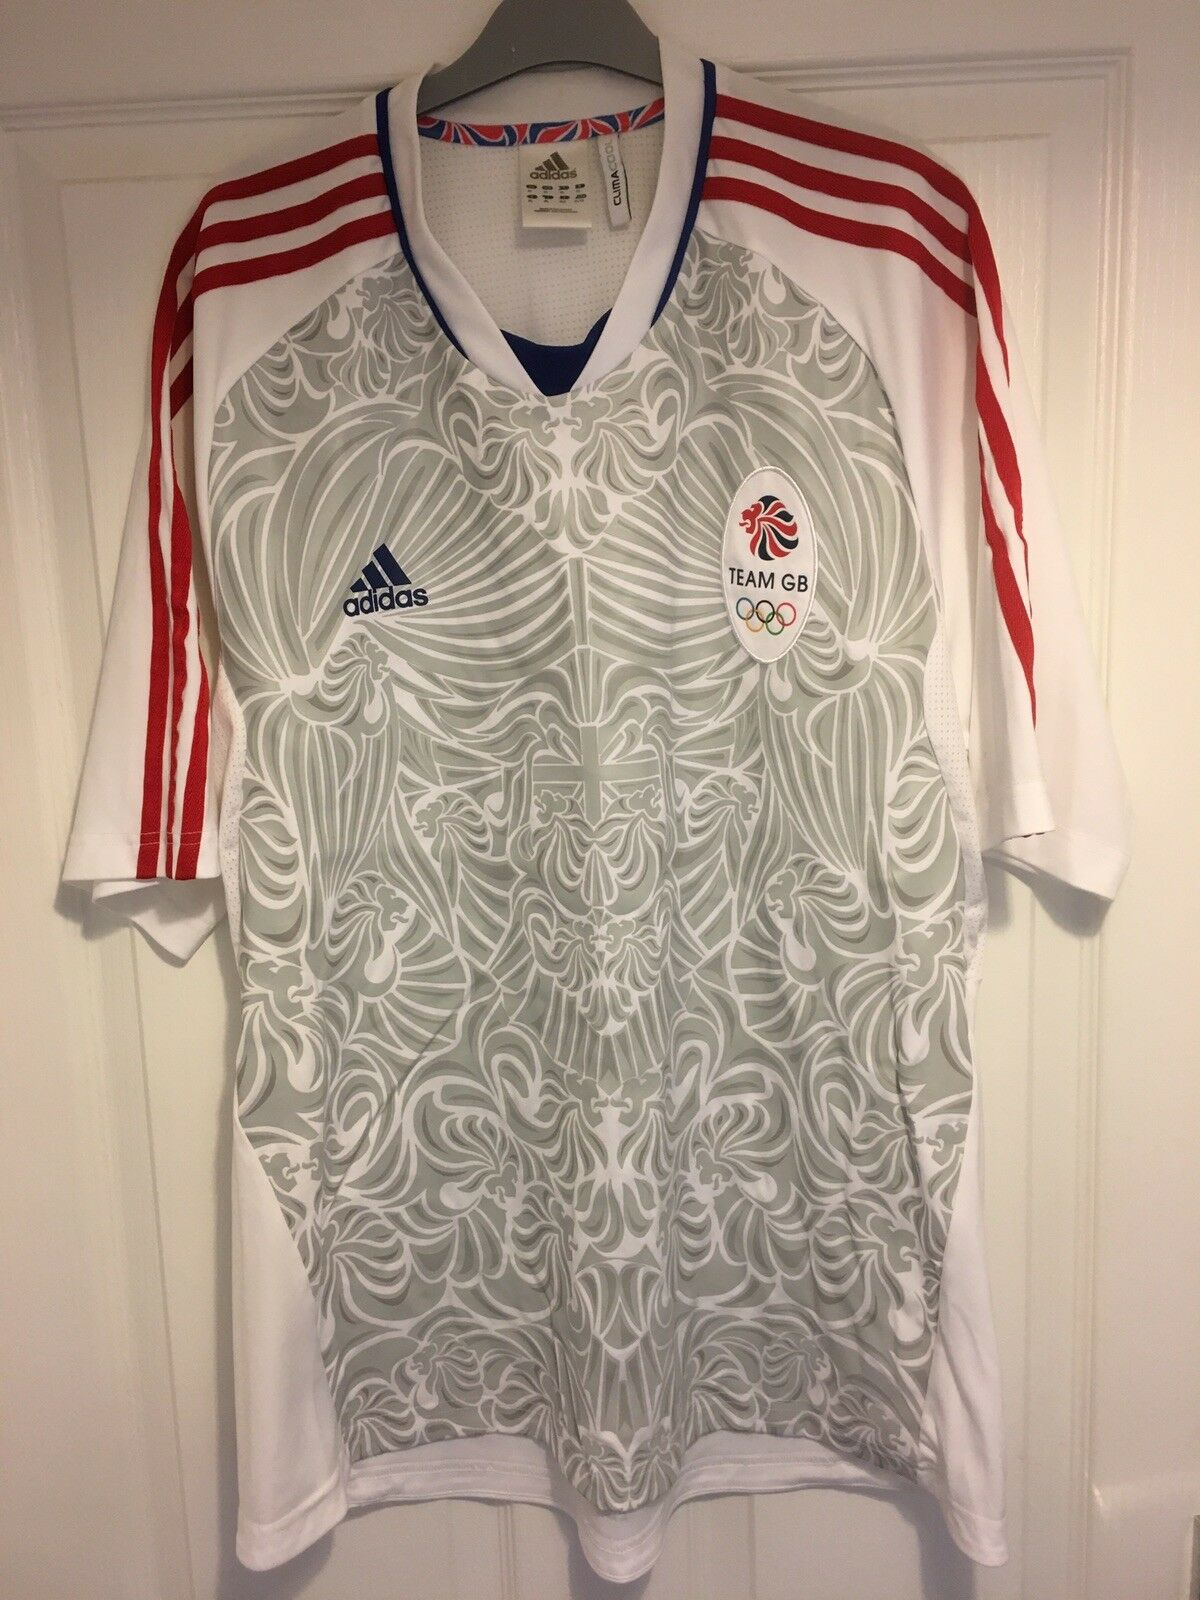 Equipo de GB Edición Limitada de 2012 Camiseta De Fútbol Adidas XL Juegos Olímpicos de hombre London Raro